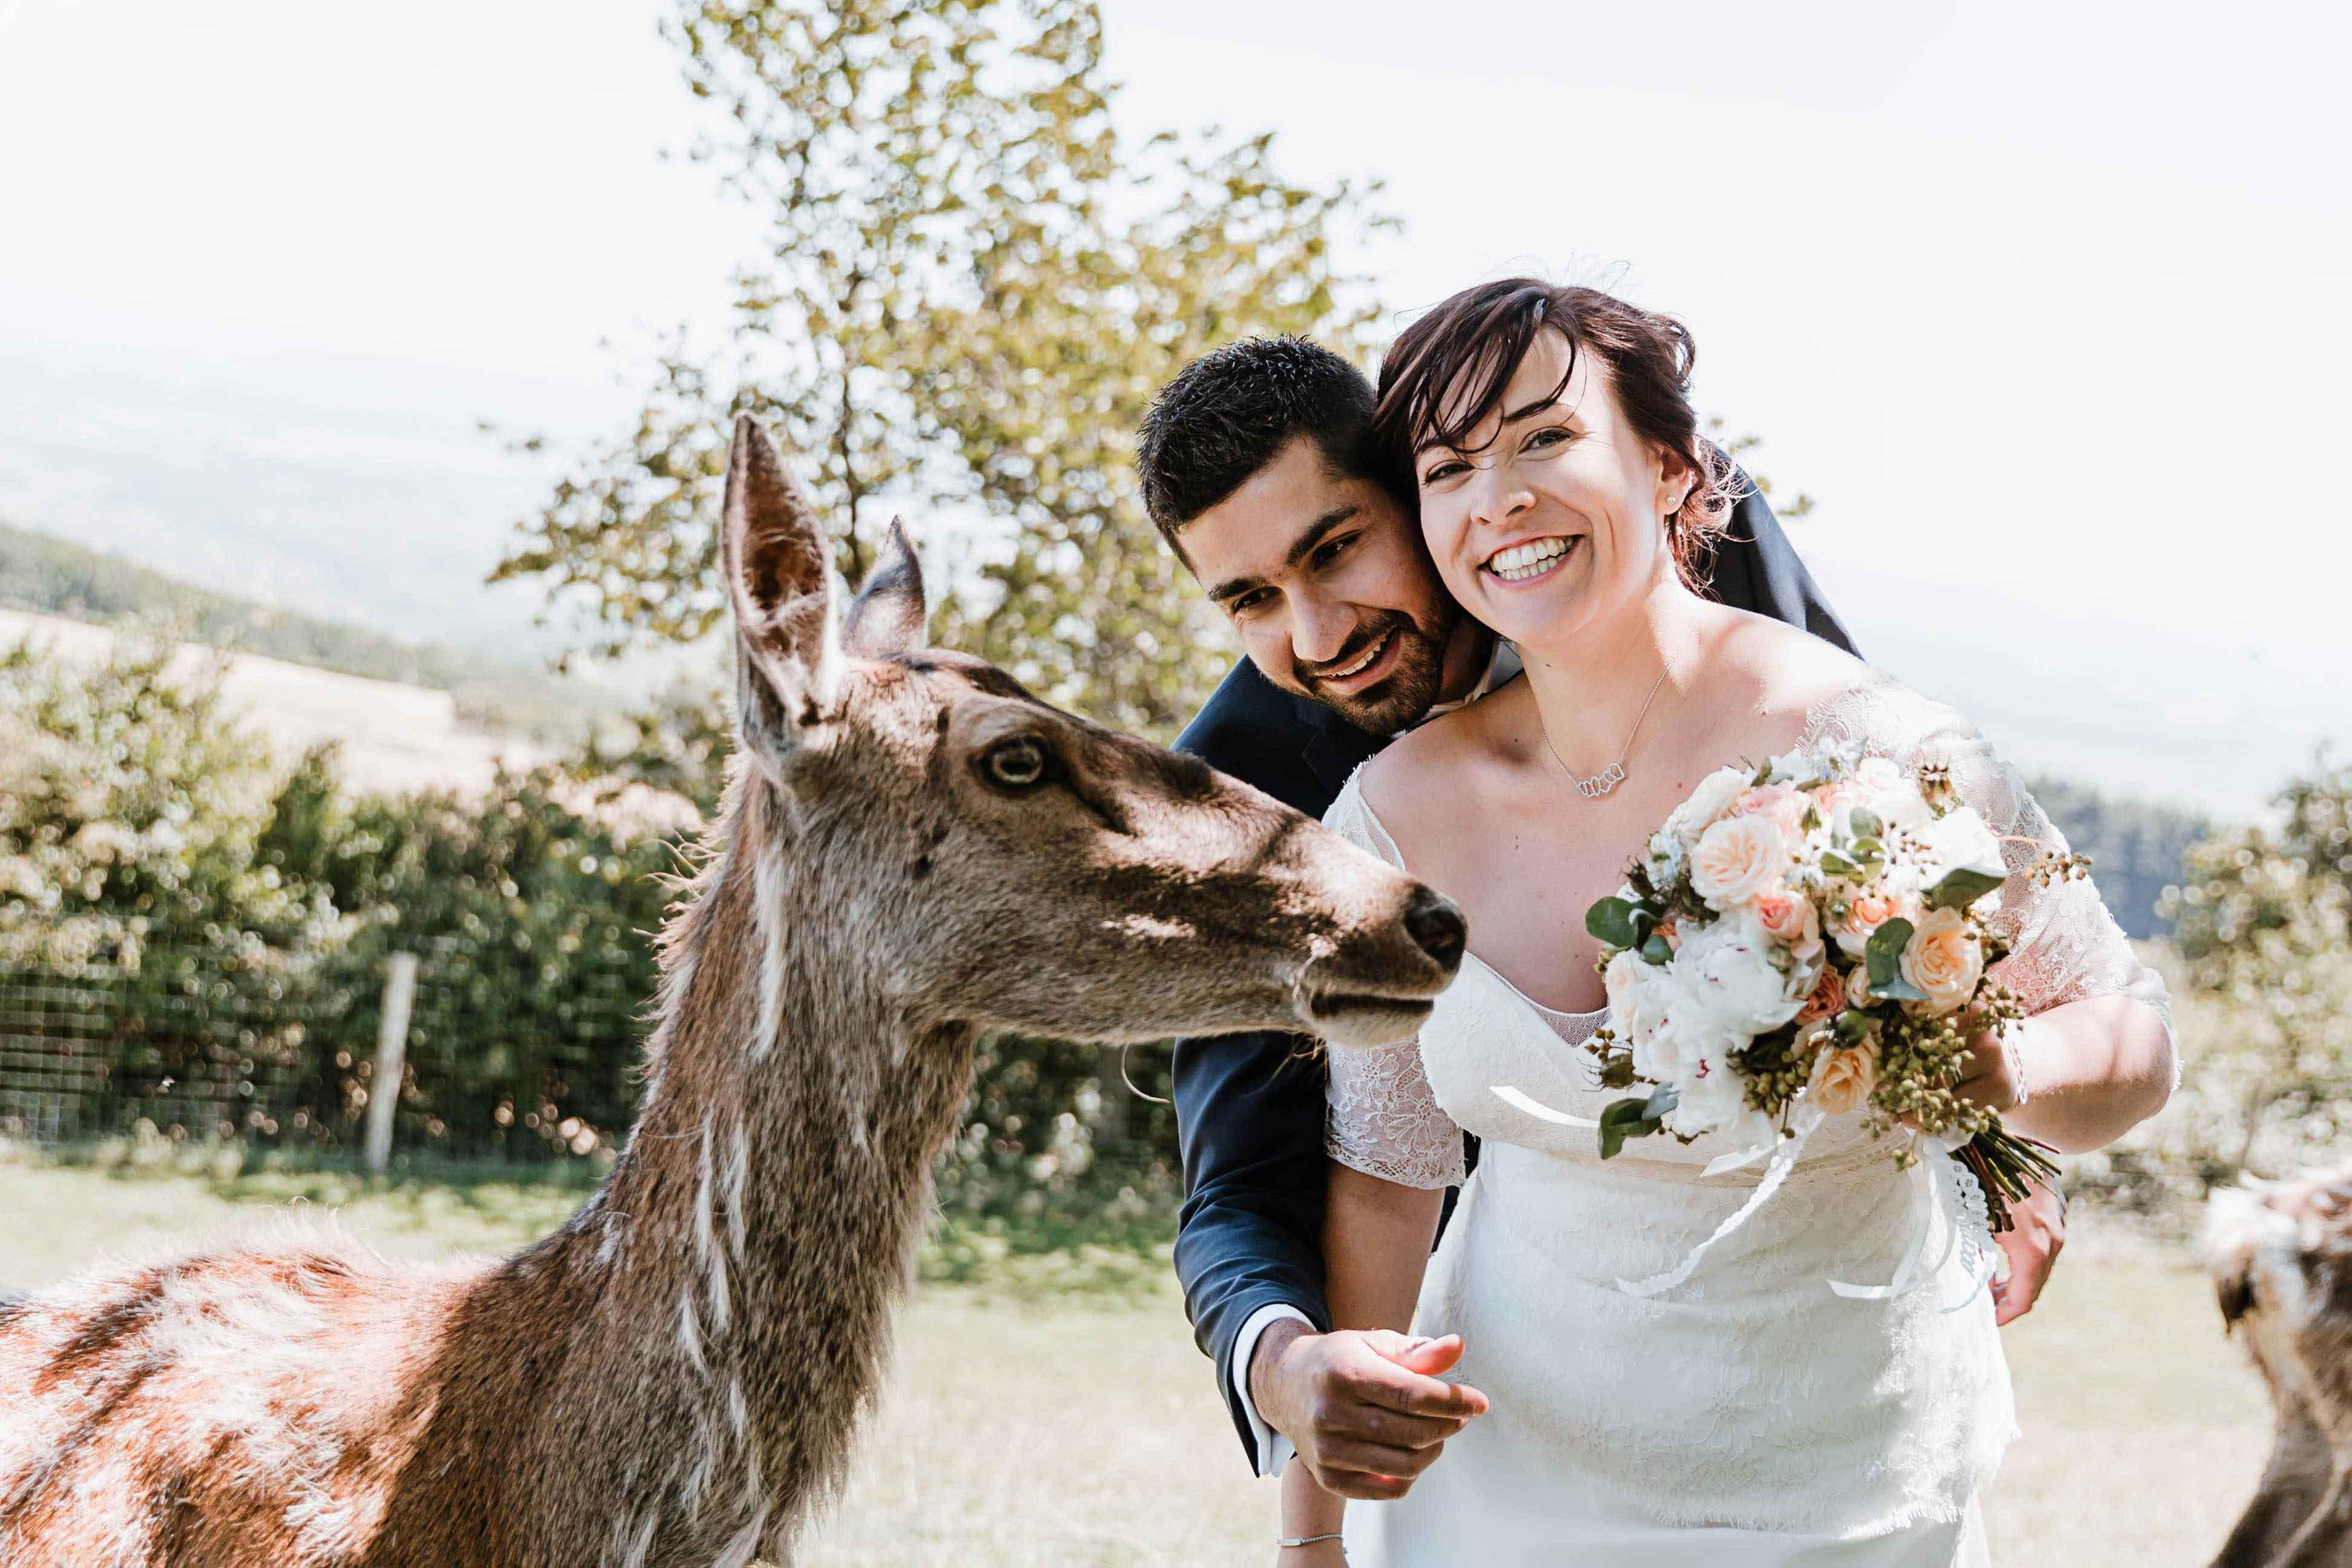 mariage biche photographe beaujolais lyon avenas